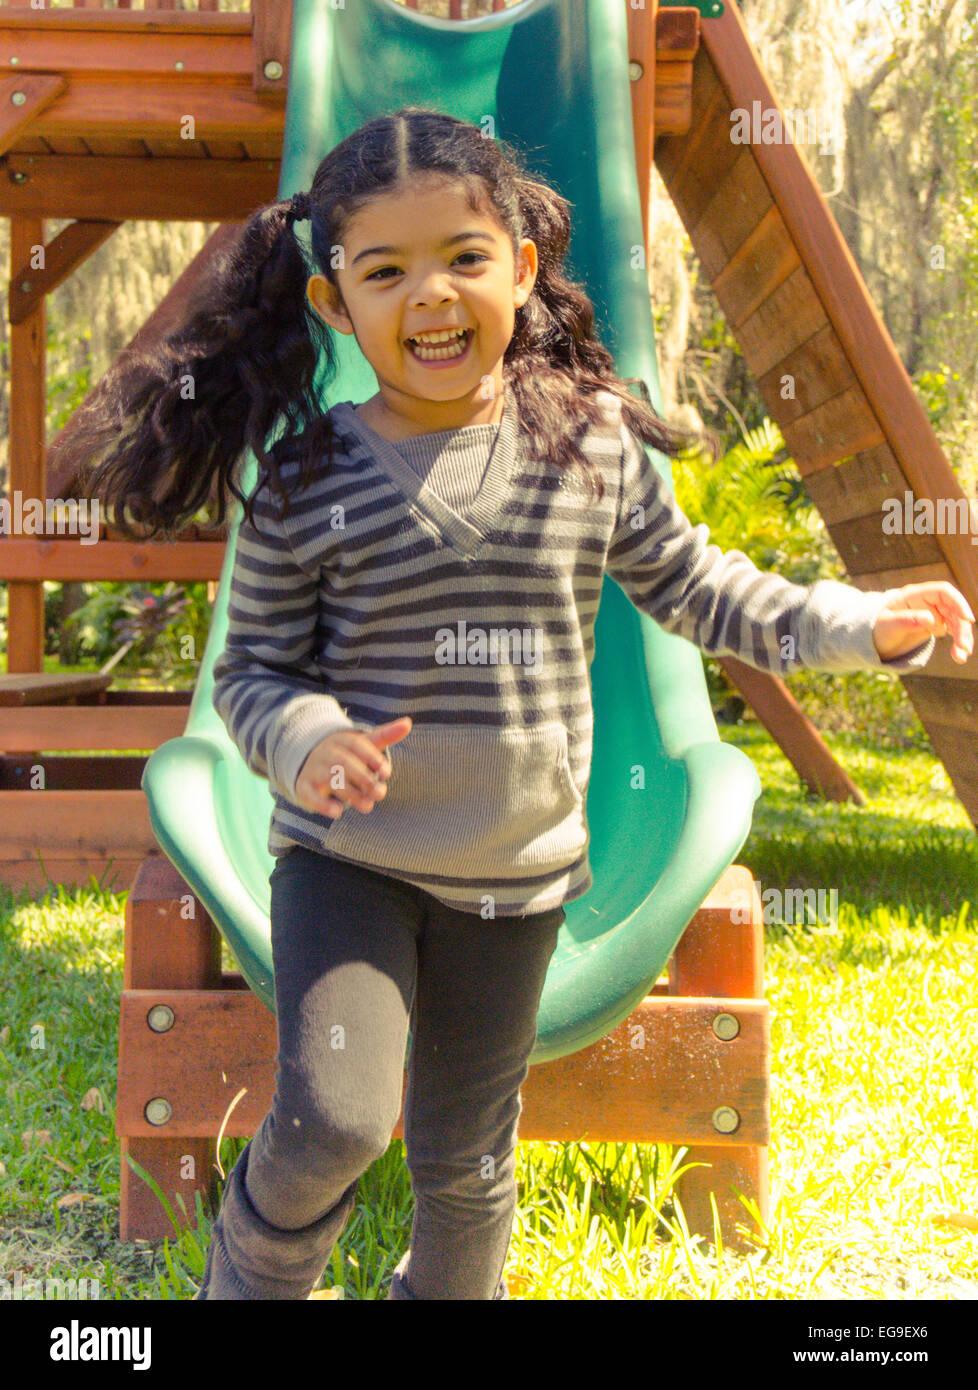 Happy girl getting off slide - Stock Image